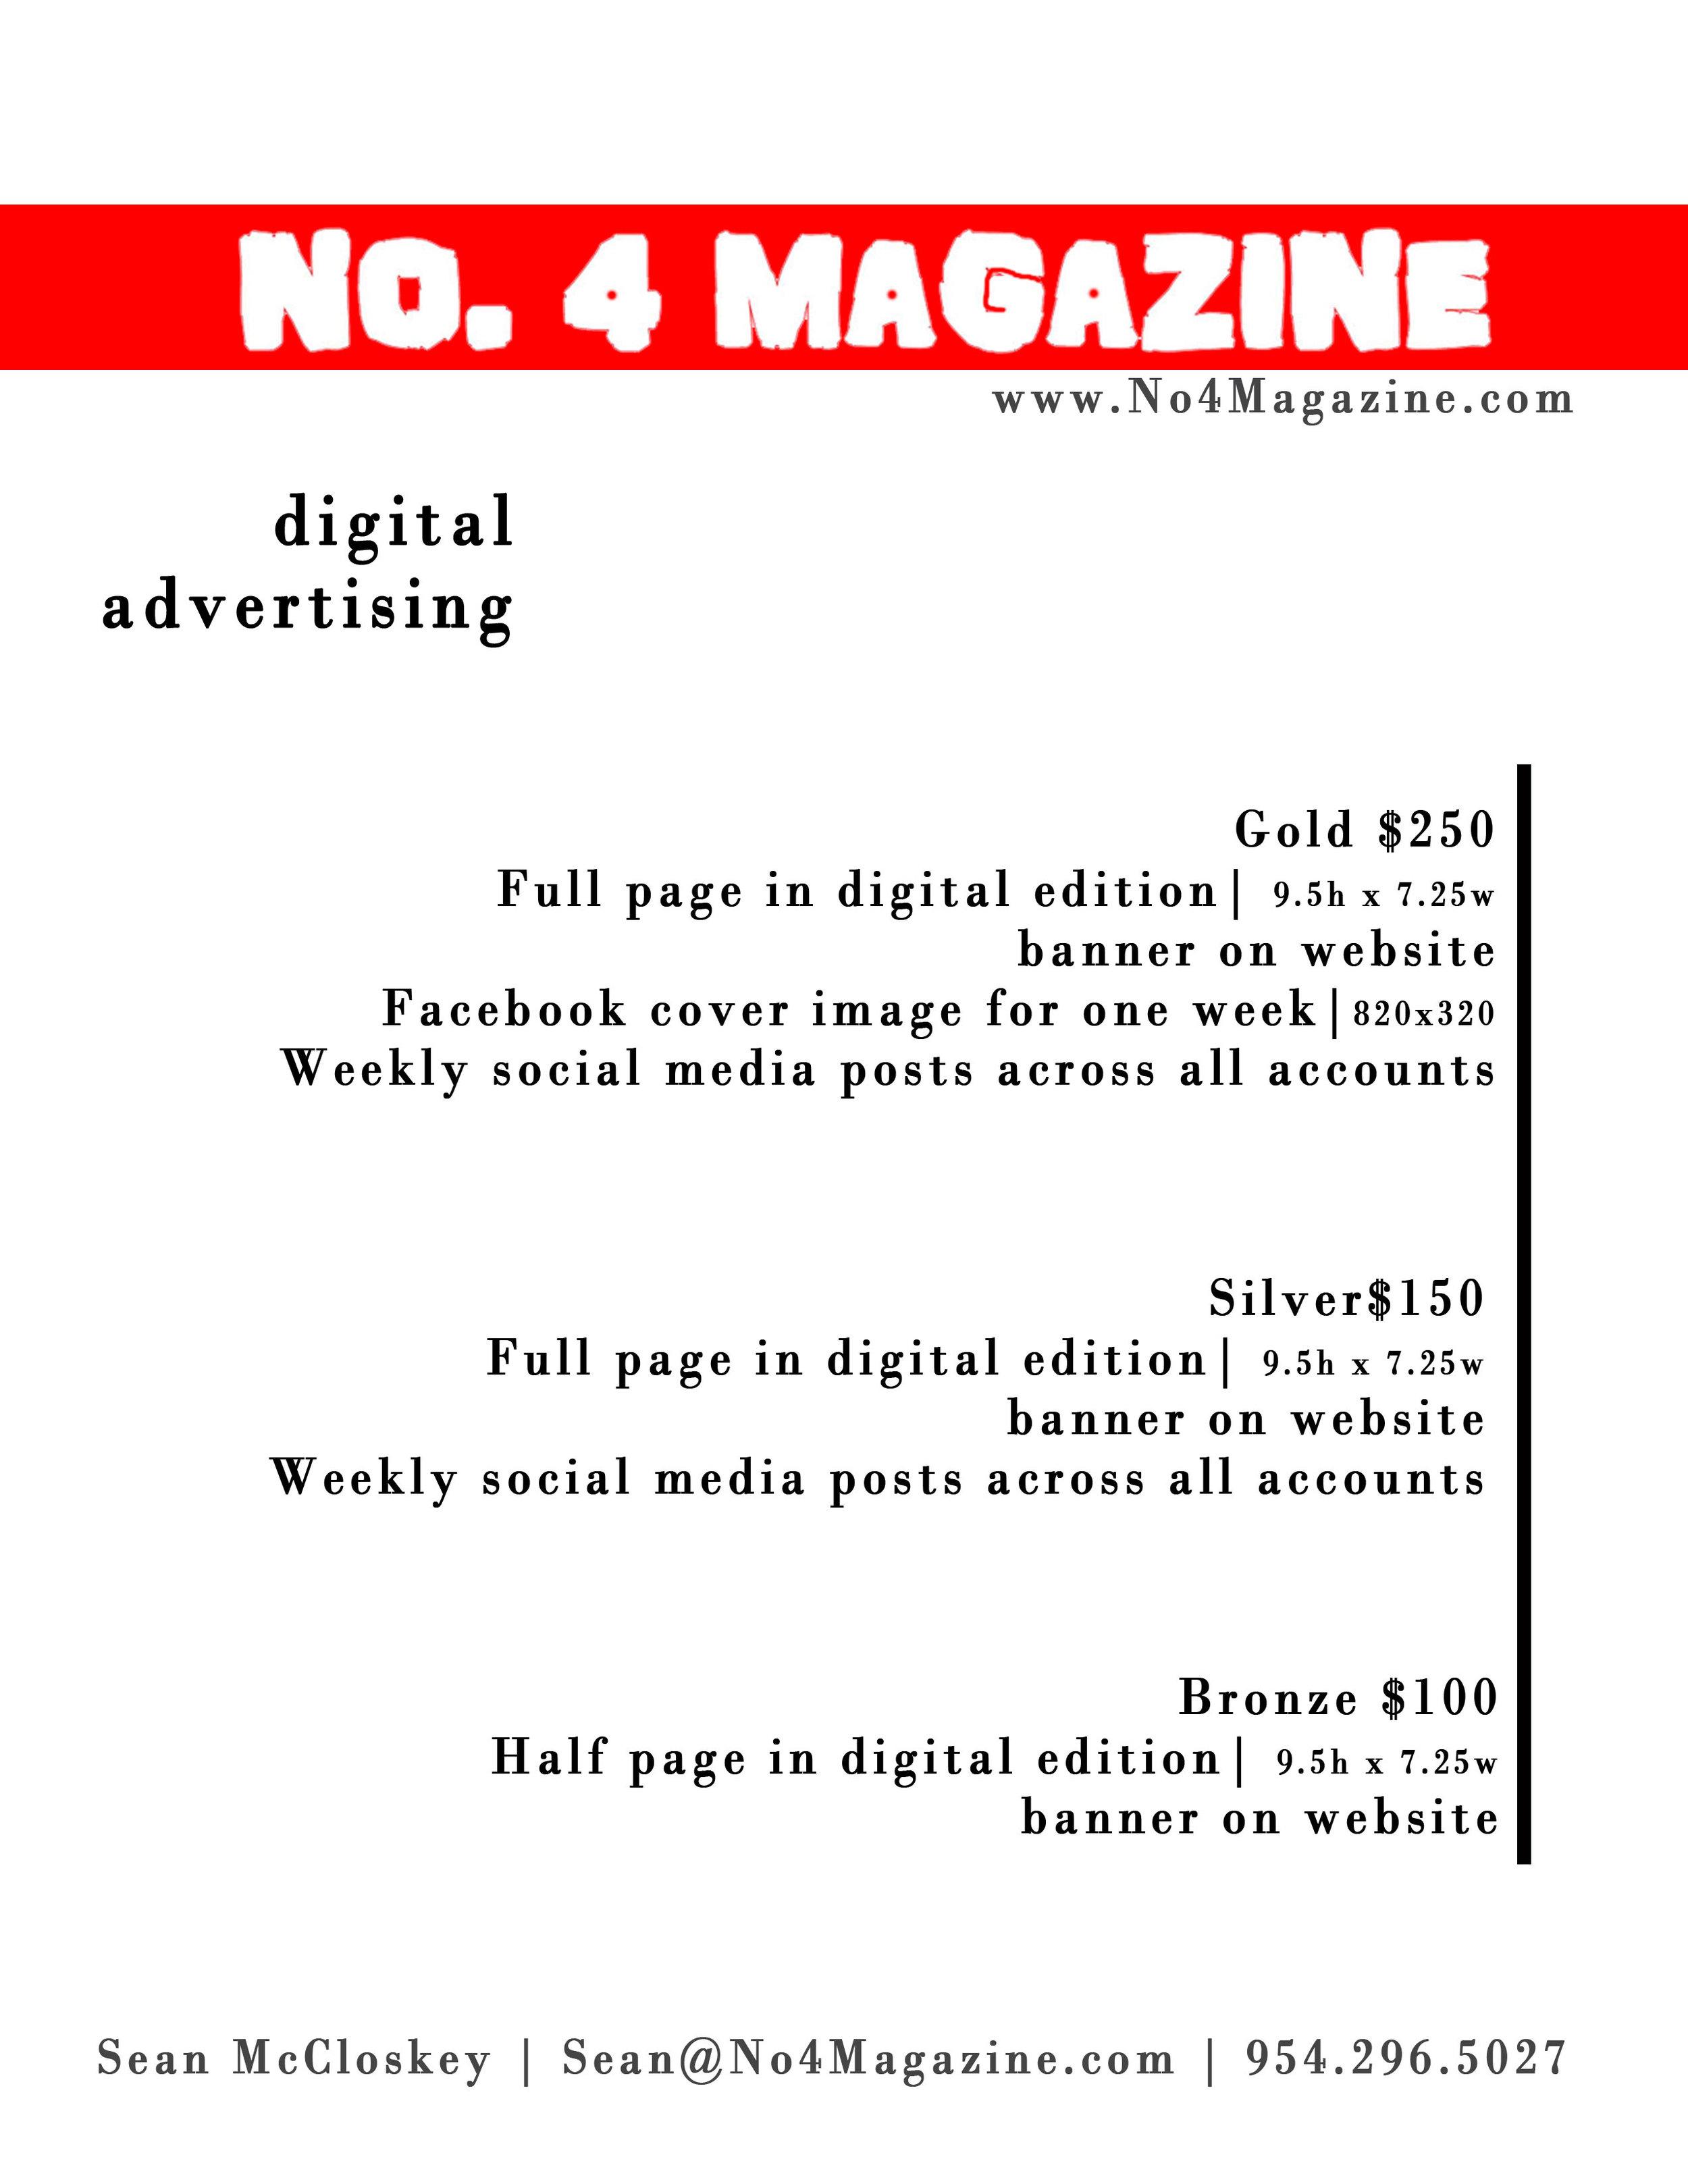 No4Magazine-Advertising.jpg